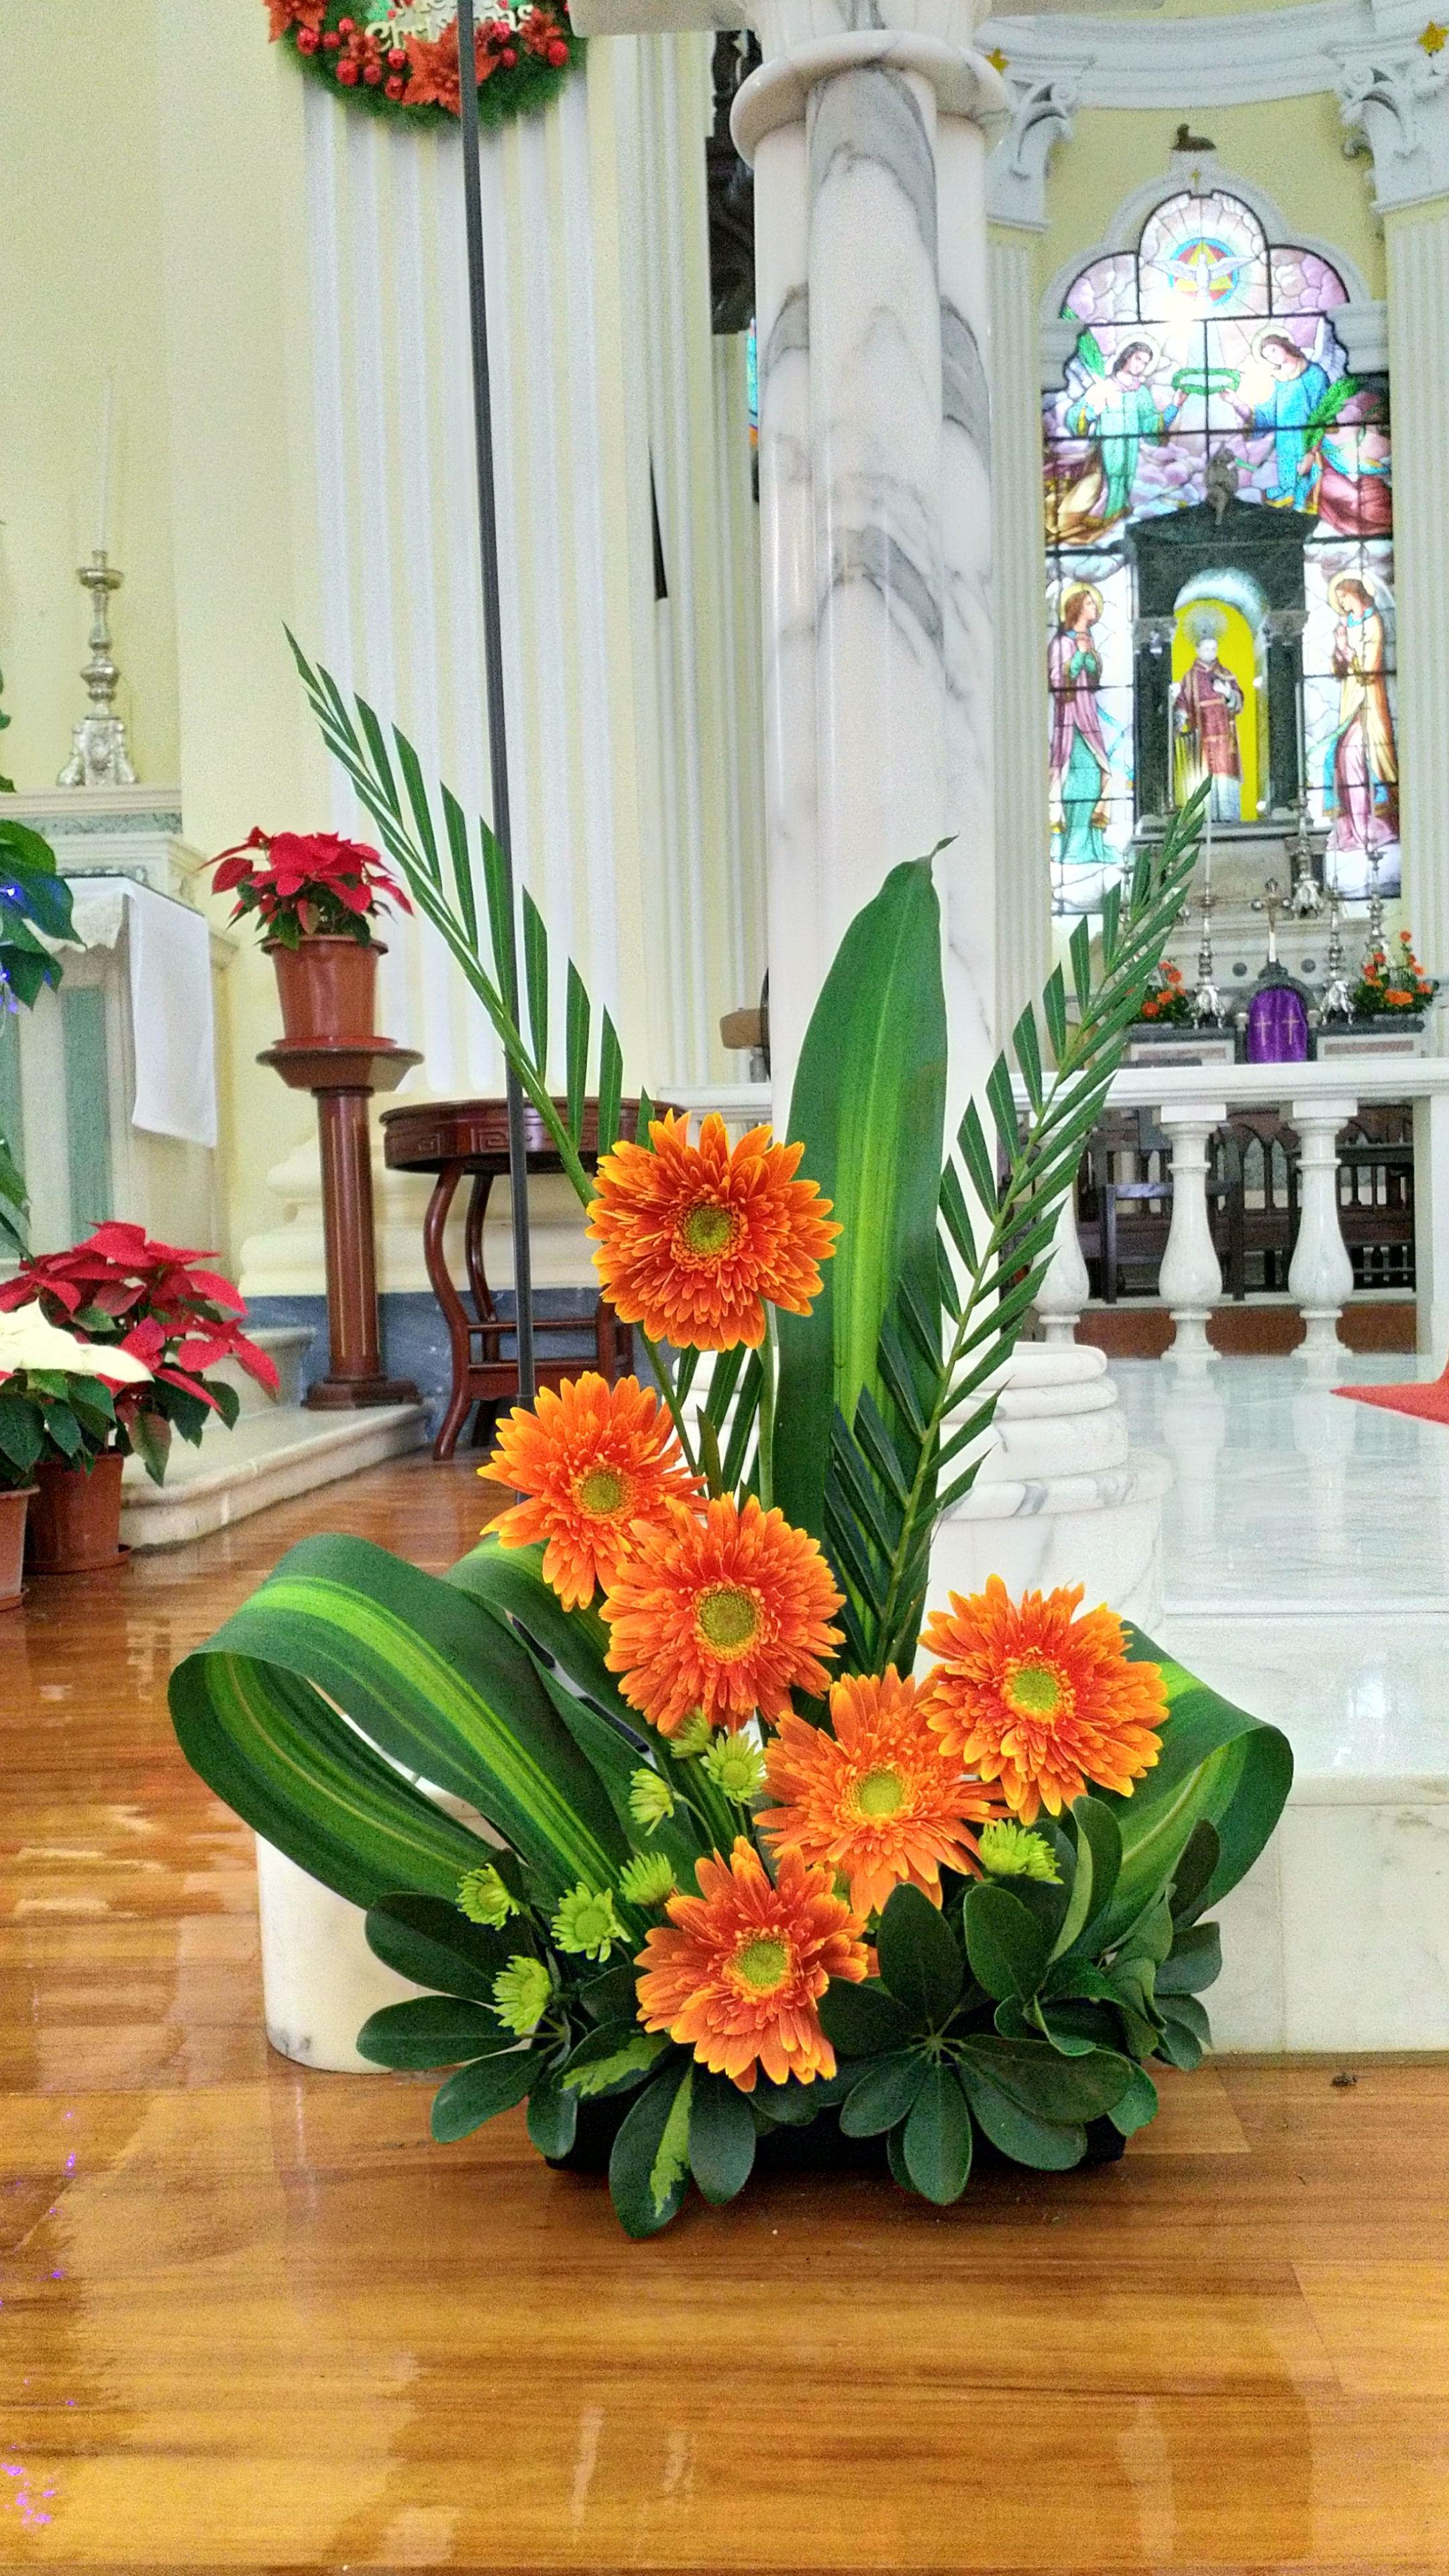 2018 12 15 Igreja De Sao Lourenco Macau Sar Tropical Flower Arrangements Tropical Floral Arrangements Modern Flower Arrangements